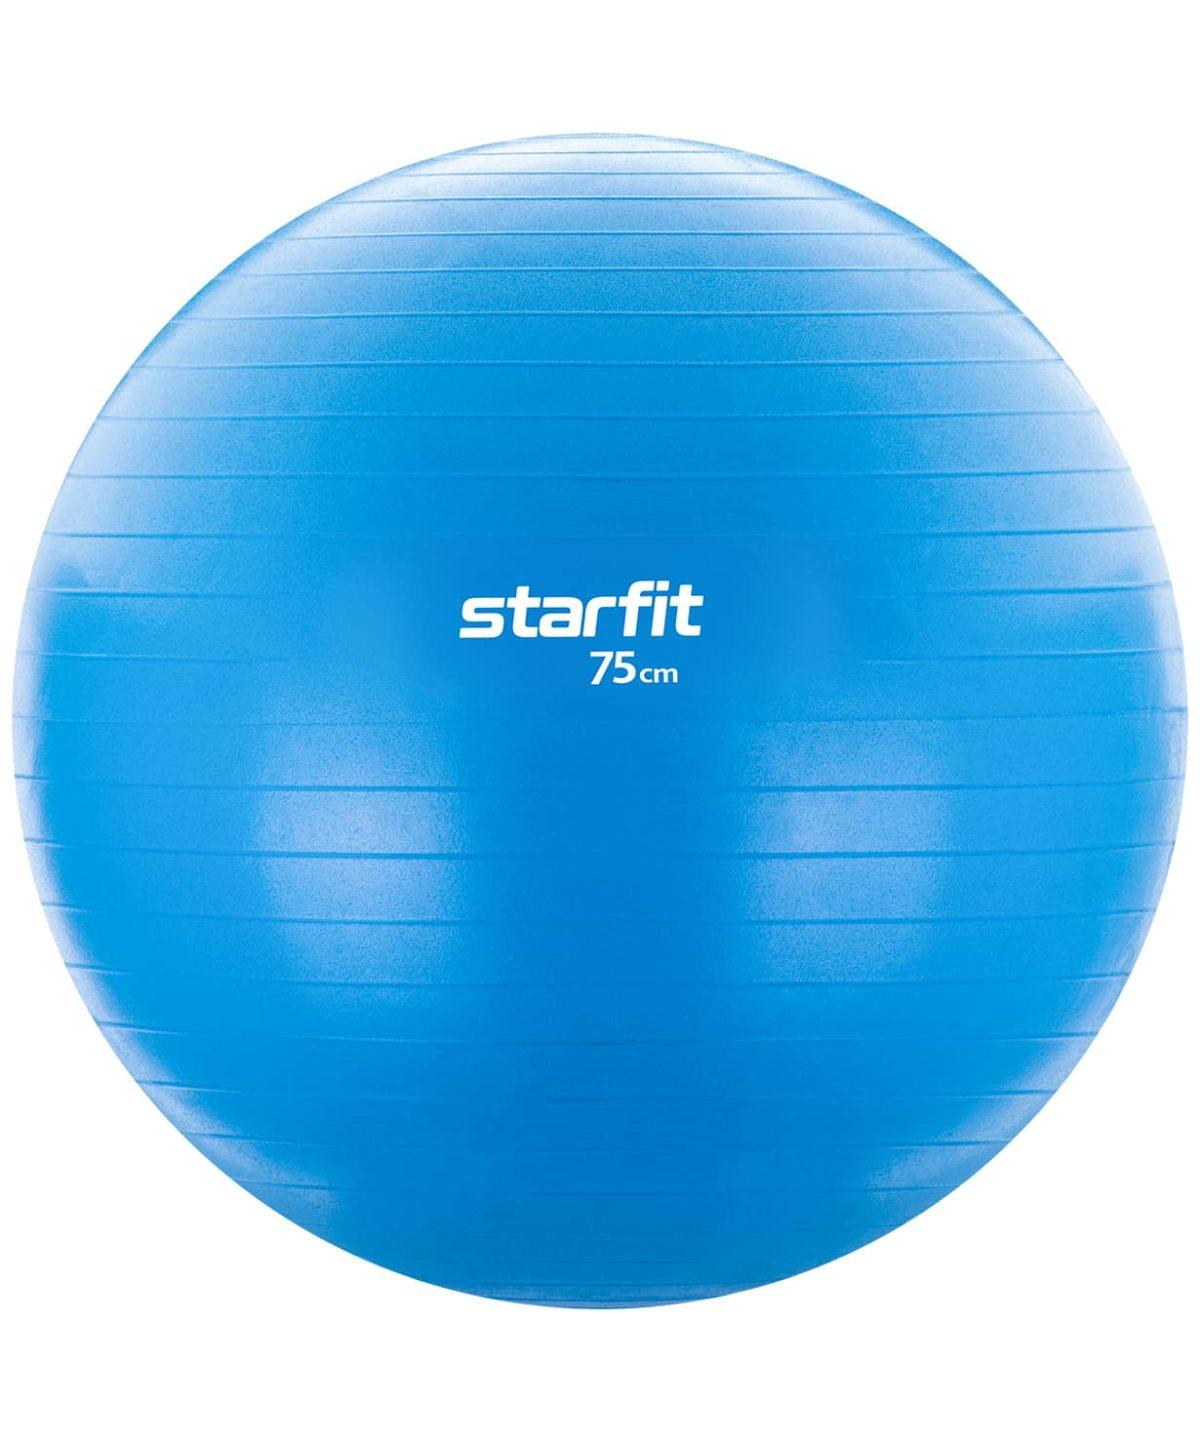 STARFIT Фитбол антивзрыв 75 см 1200 гр, без насоса GB-104: голубой - 1